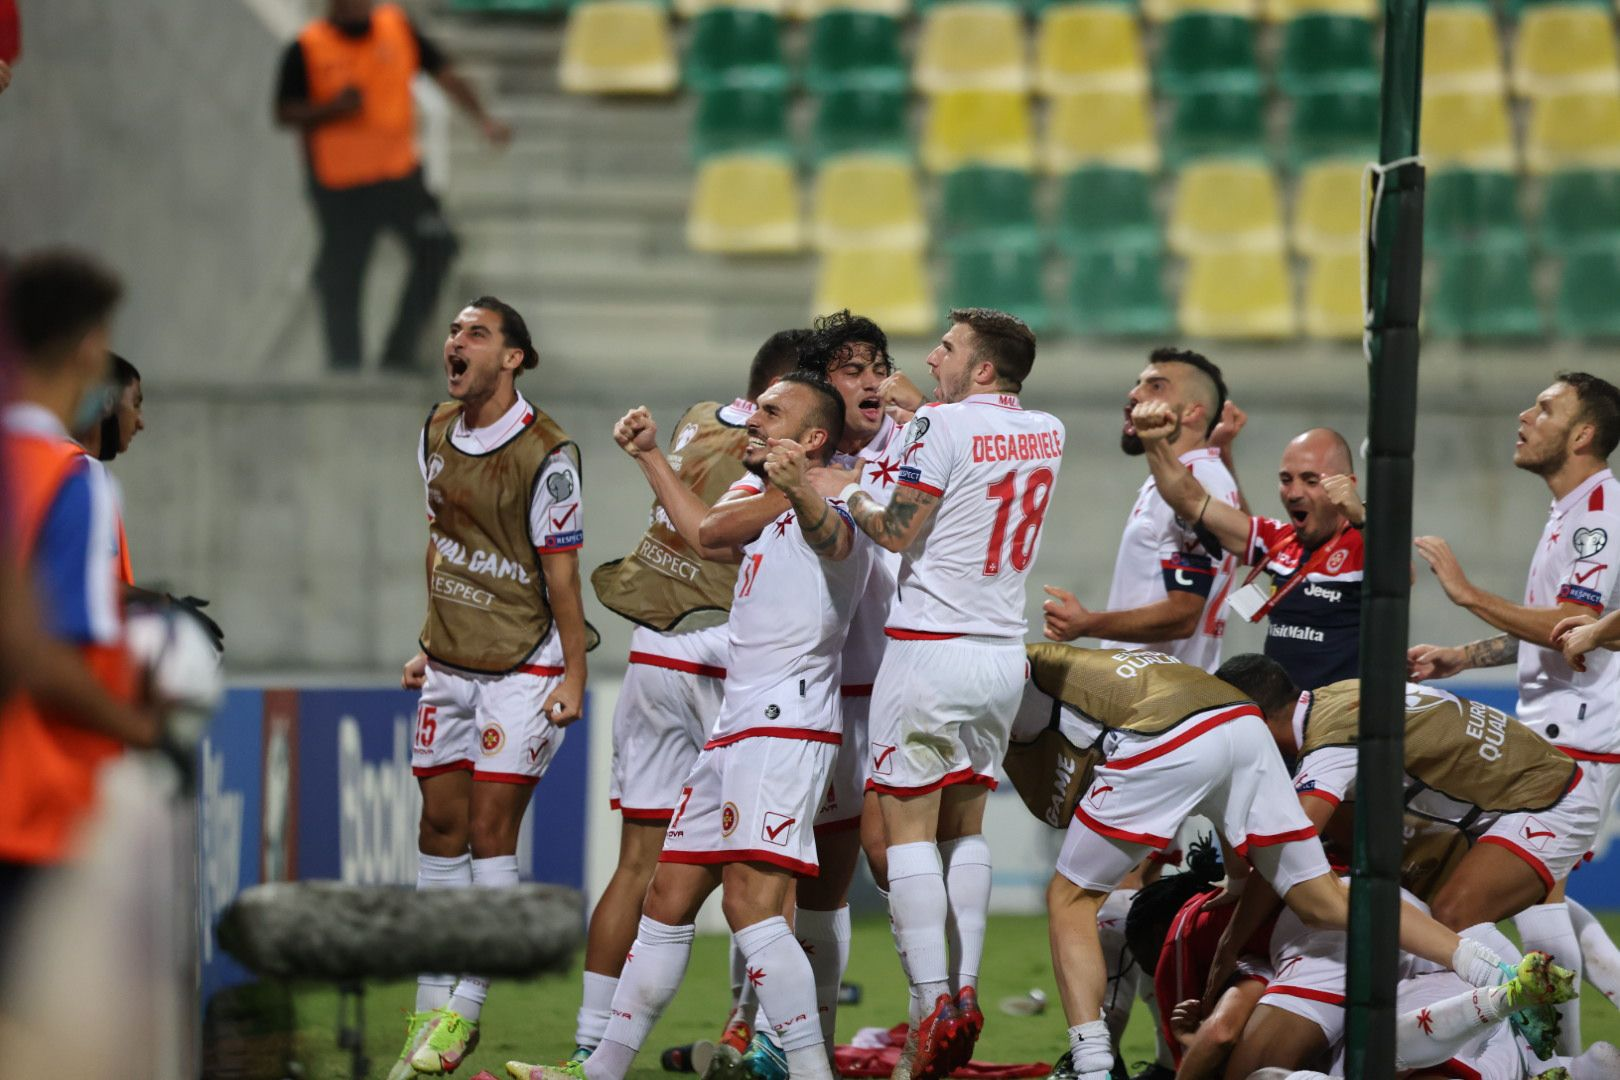 Read more about the article Malta's Jurgen Degabriele scores greatest last minute equaliser goal ever